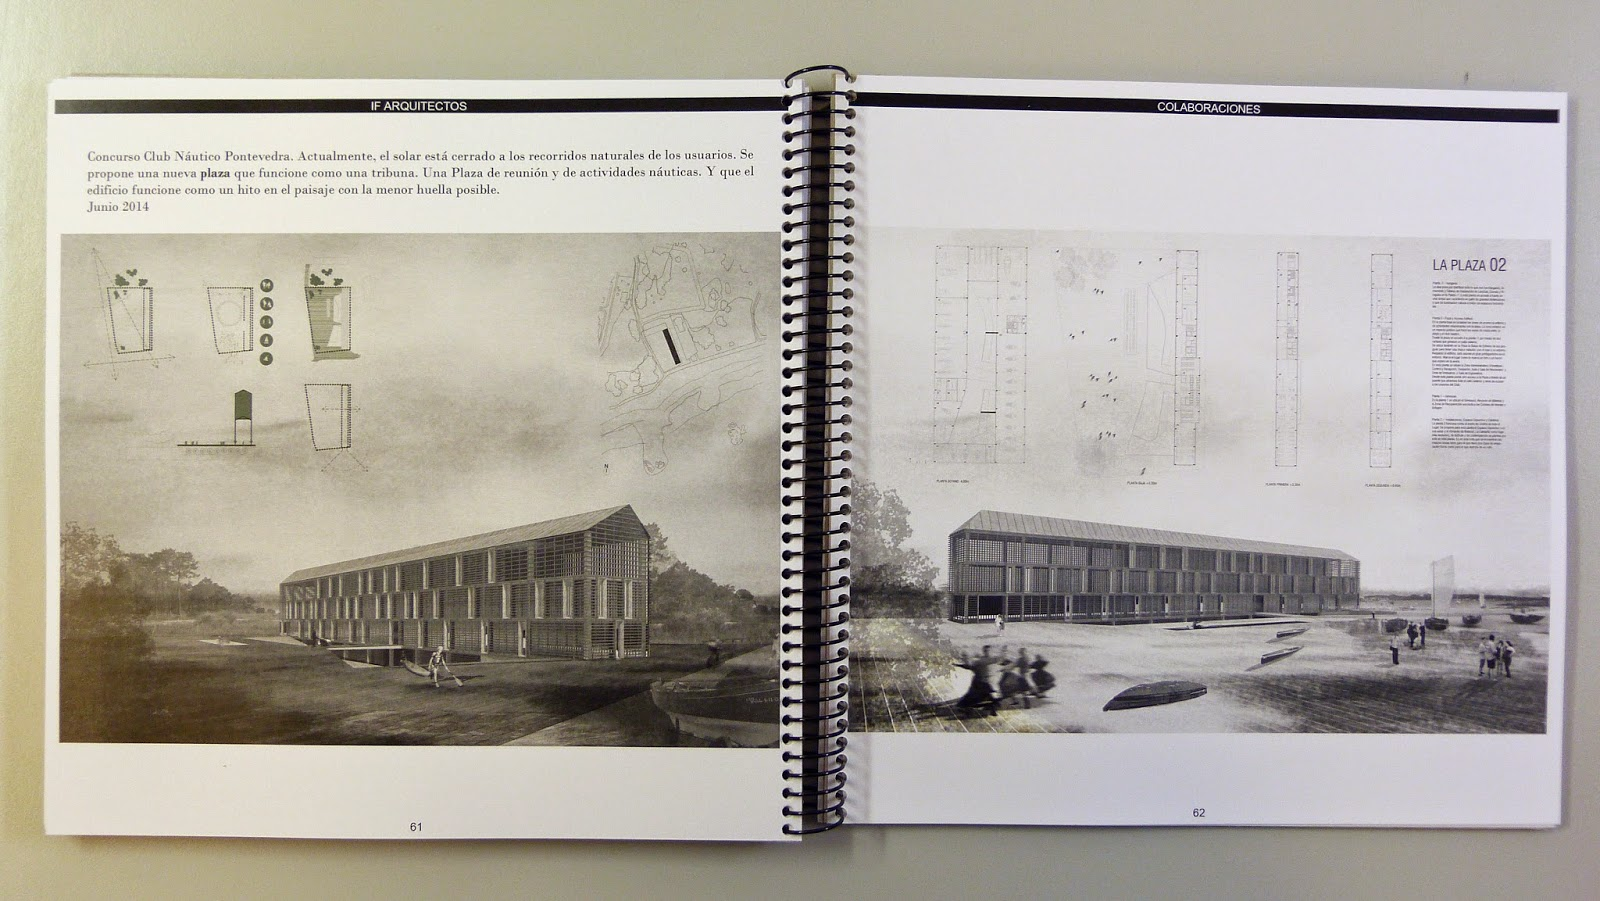 Cr nicas de un estudiante de arquitectura mi primer for Portafolio arquitectura